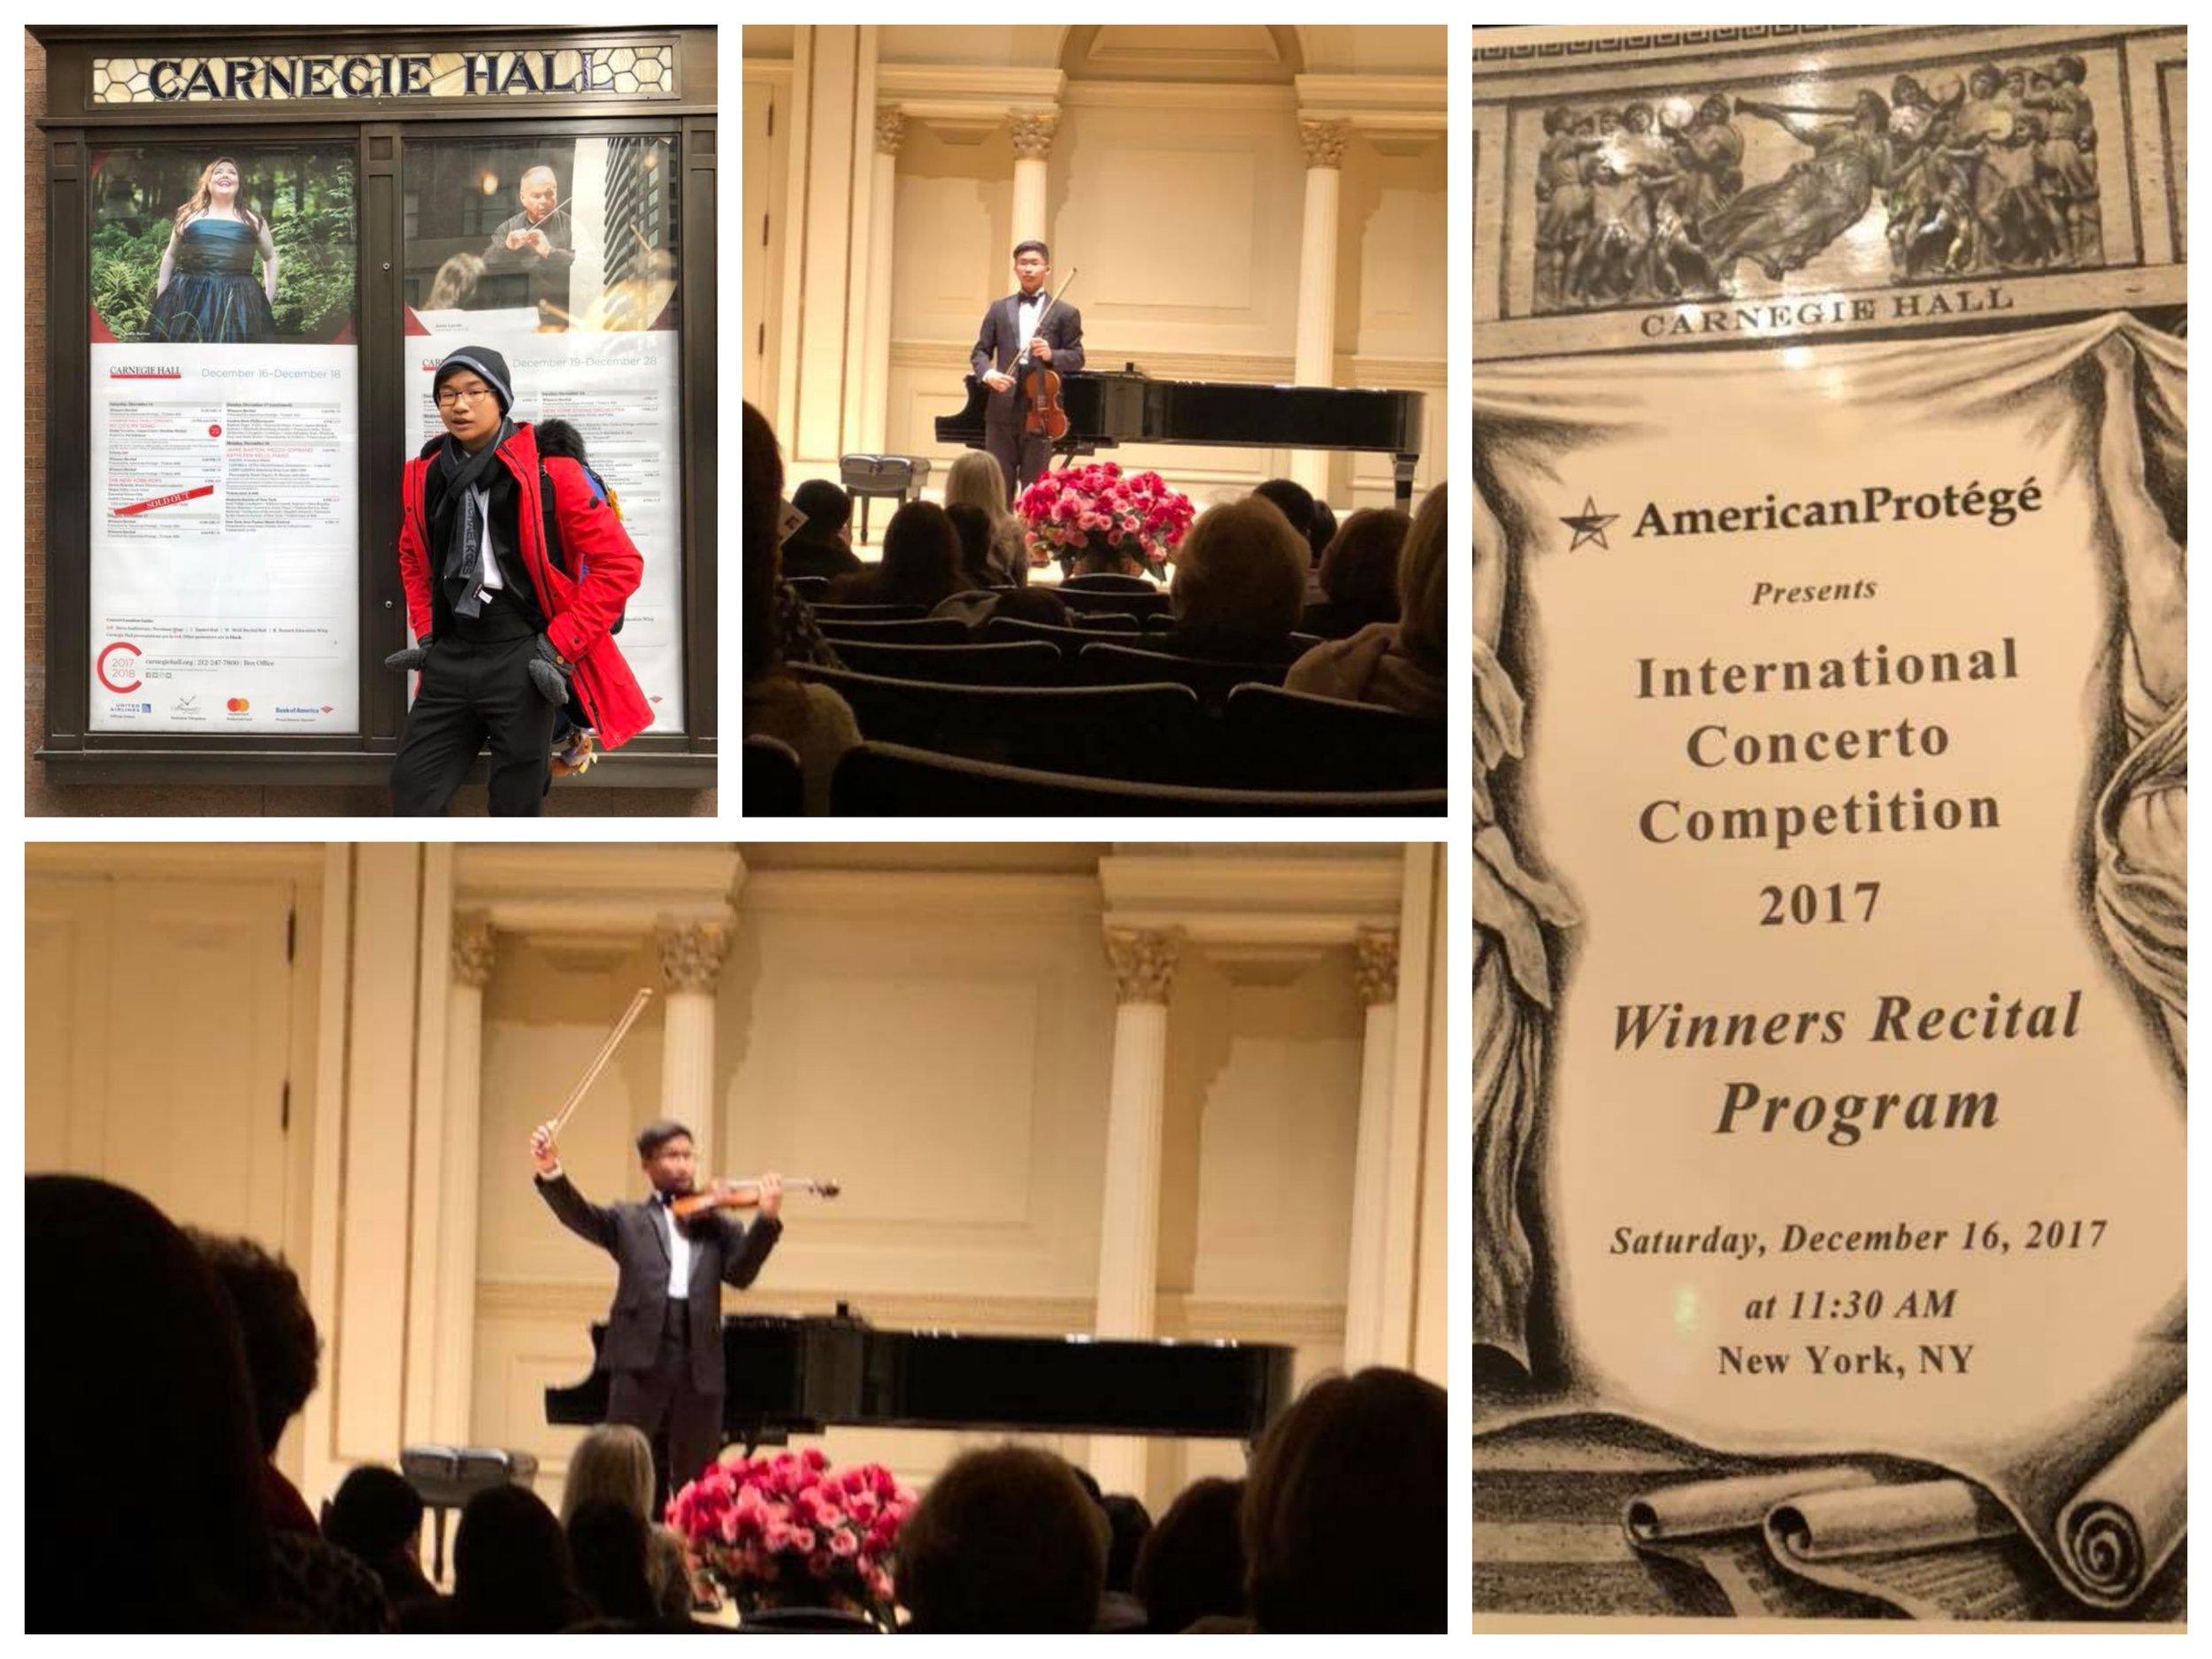 William SuwandiAge 14 - Carnegie Hall December 2017